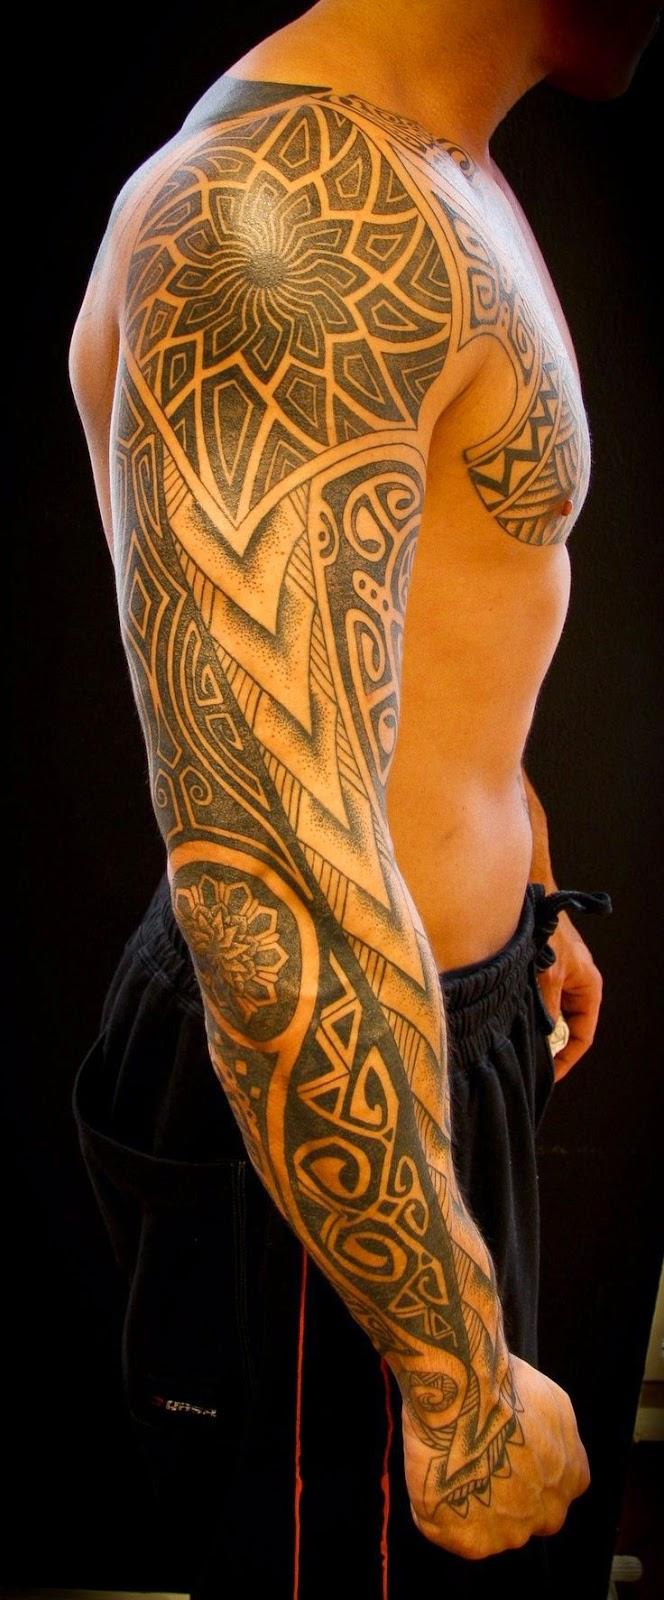 Chest To 1 4 Sleeve Koi Fish And Lotus Tattoo: Sleeve Tattoos